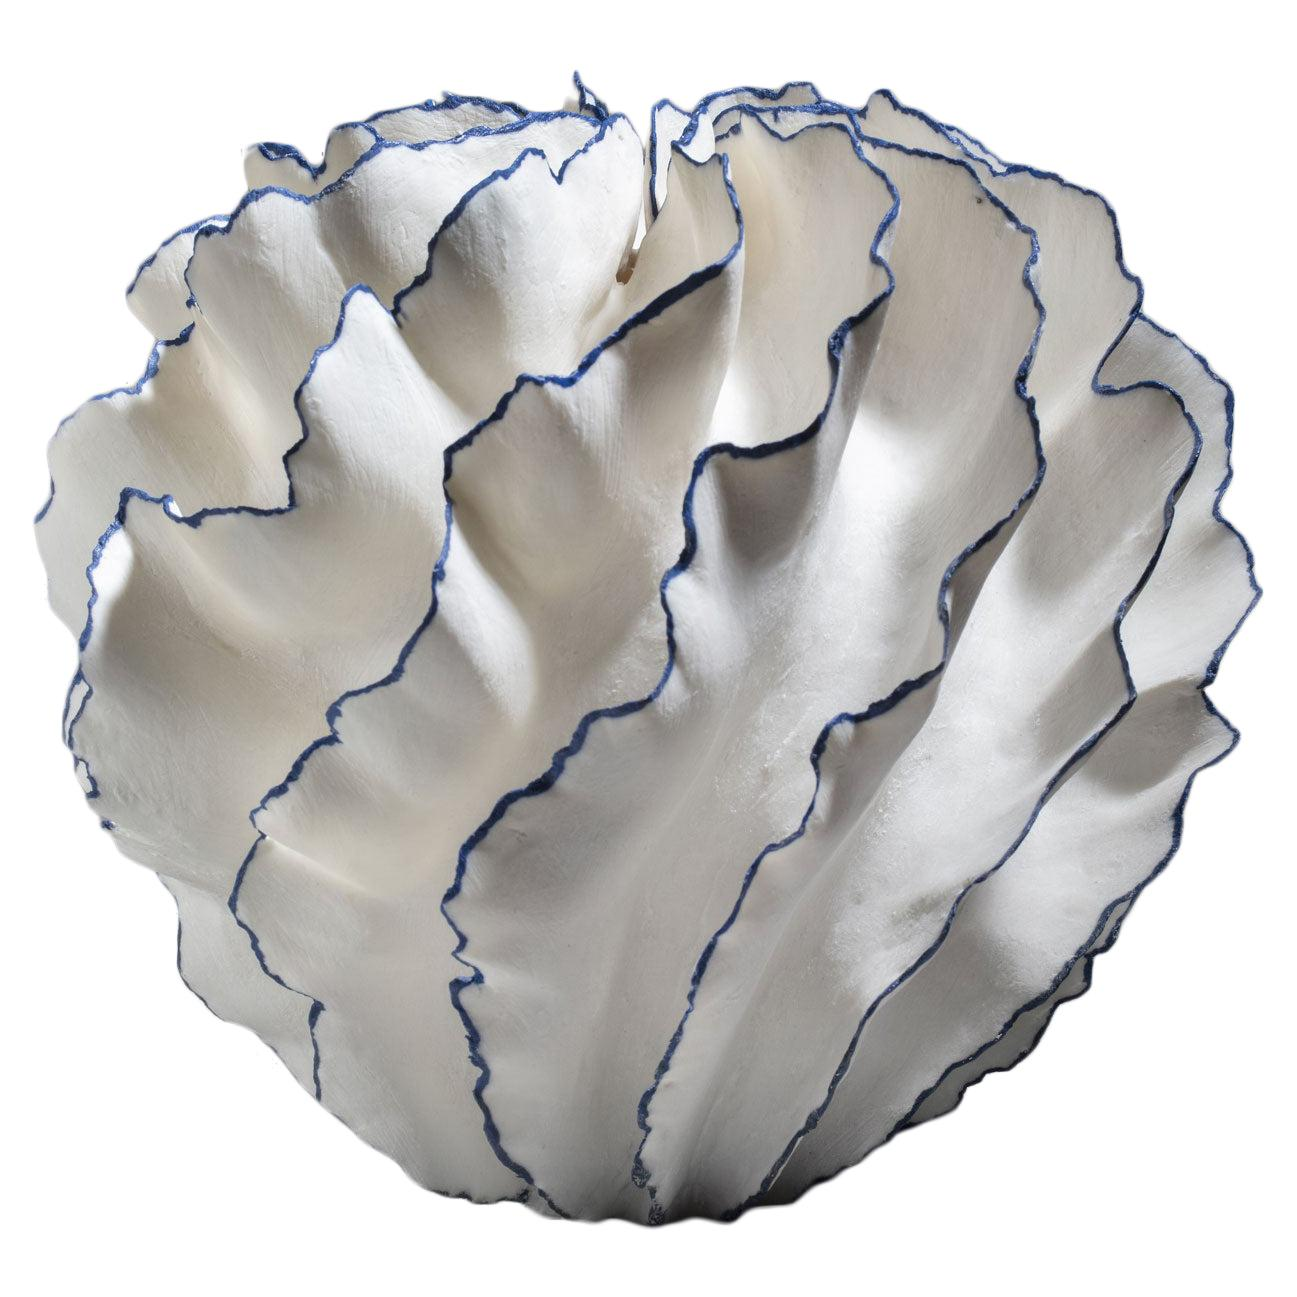 Unique White and Blue Ceramic Vase by Sandra Davolio